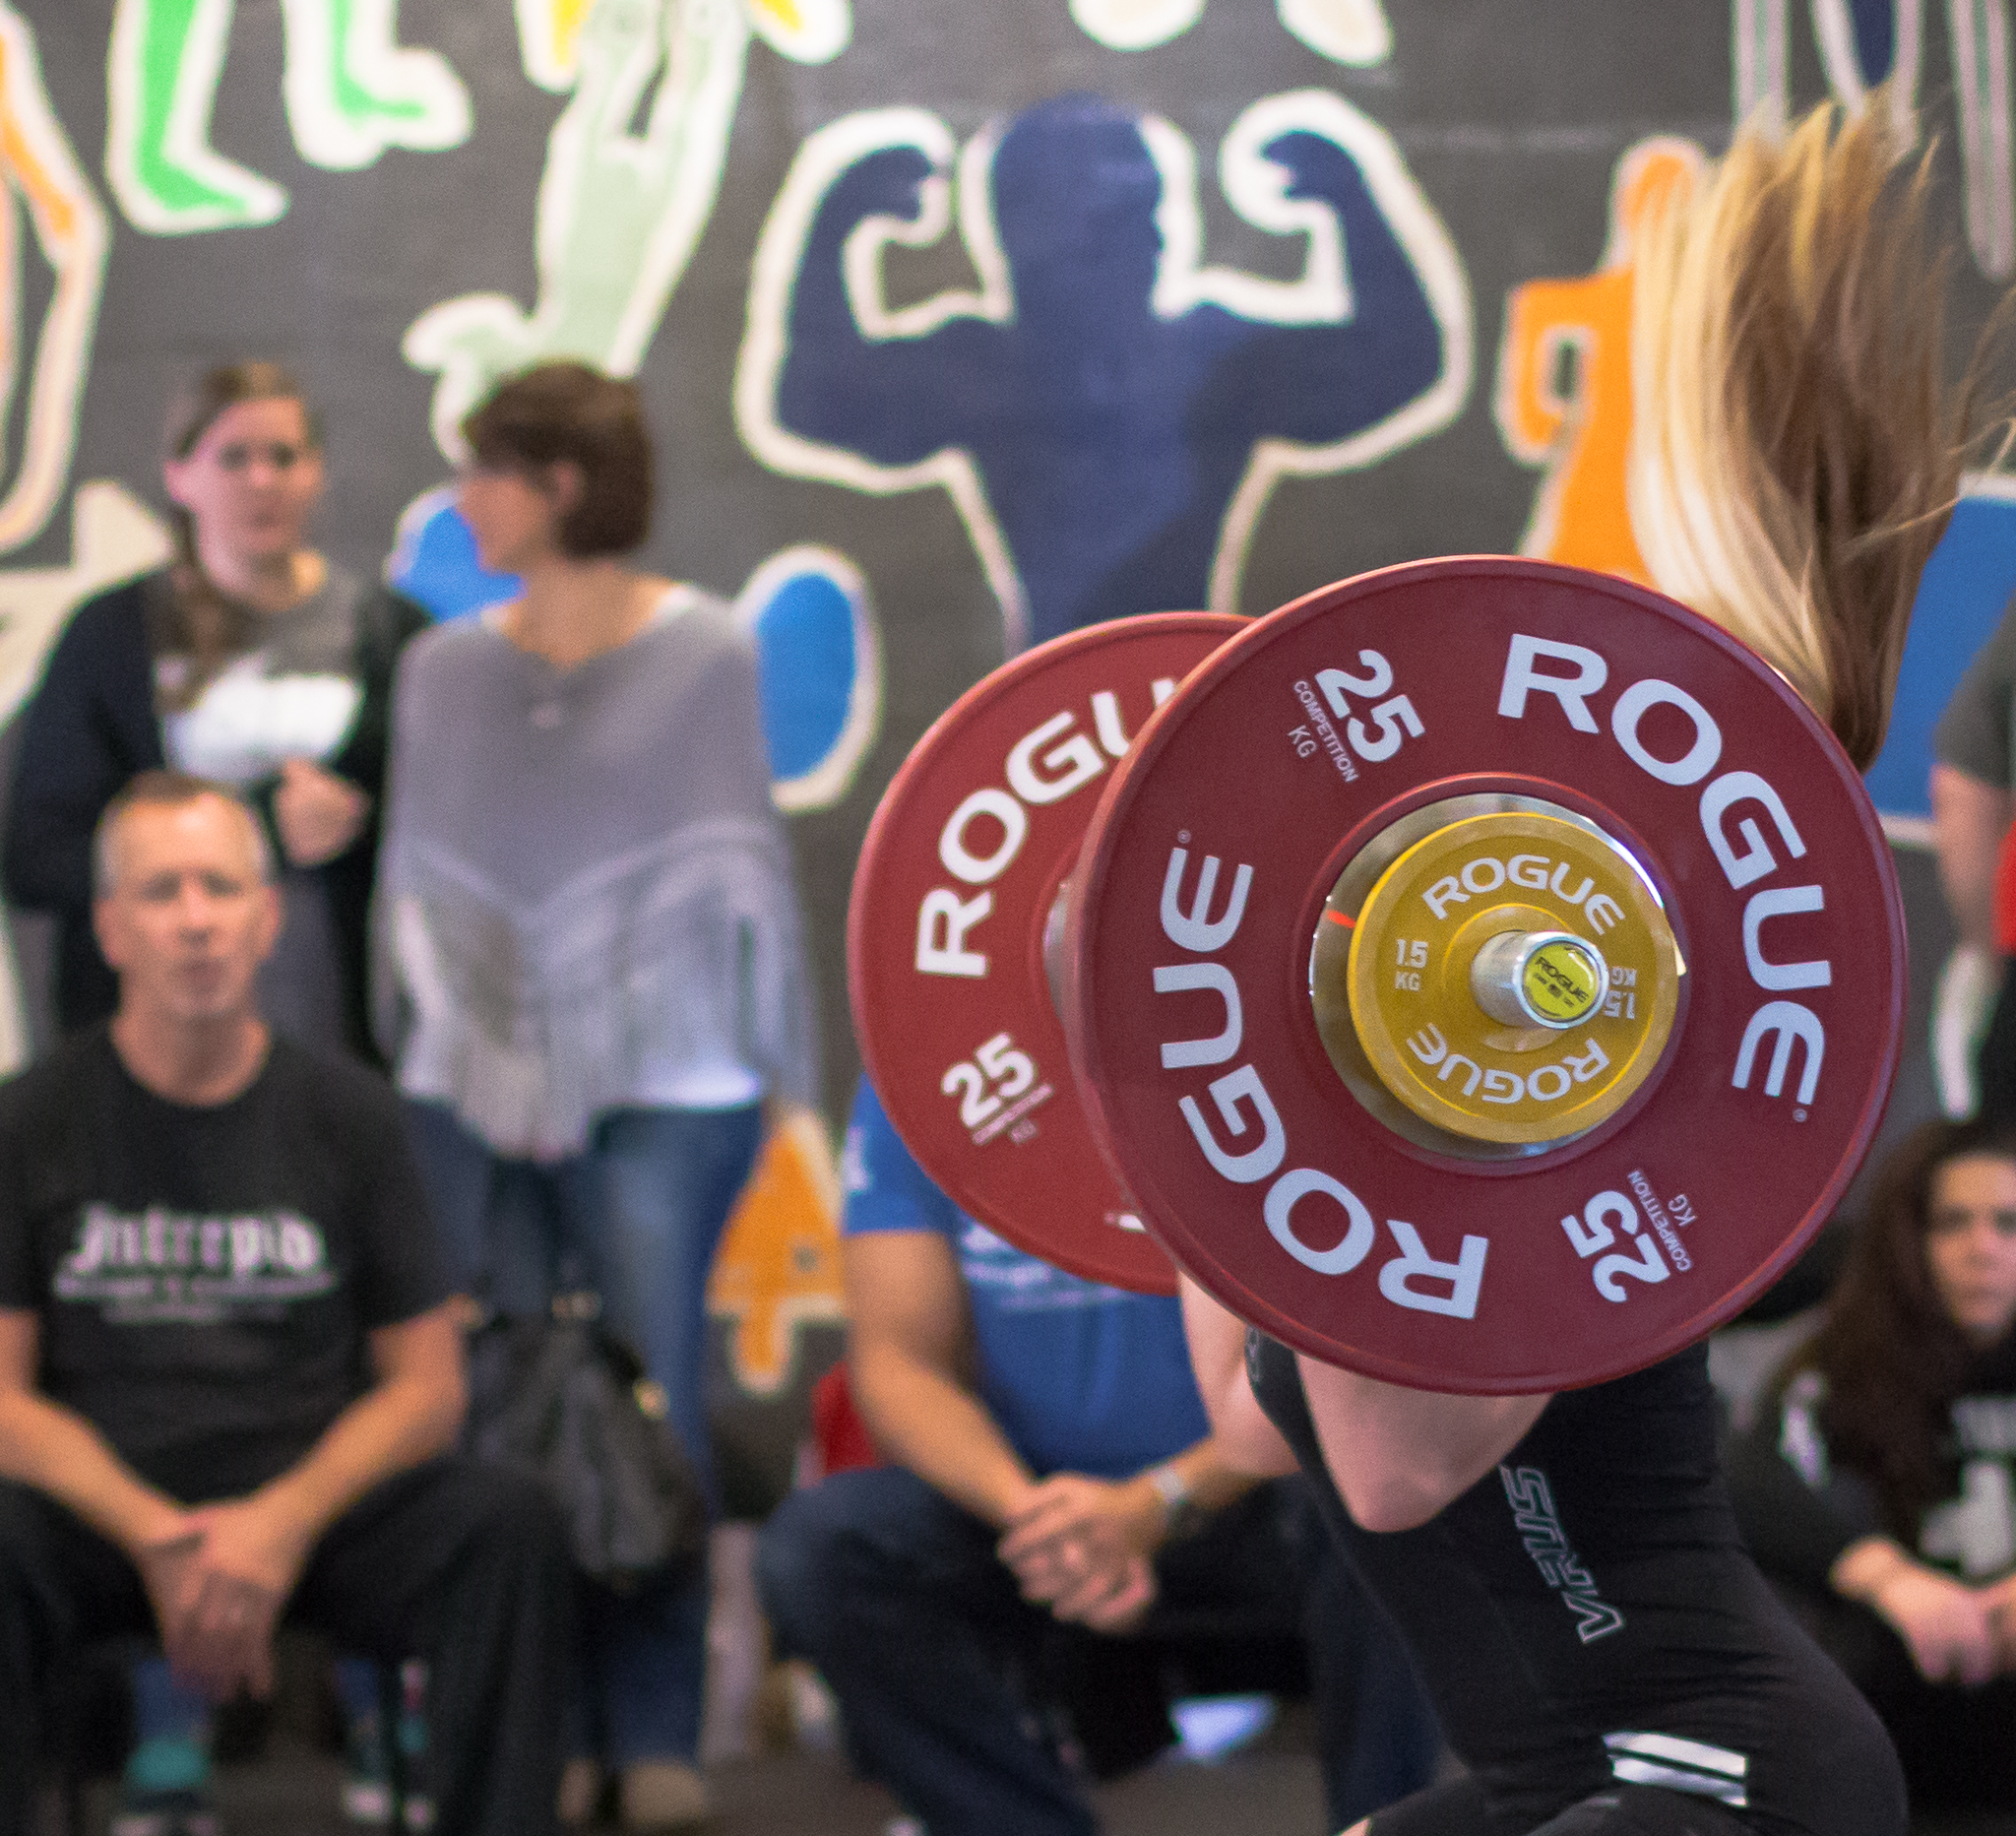 4-men-warwick-new-york-intrepid-strength-conditioning-winter-open-weightlifting-meet-weightlifting-photography (7 of 7).jpg